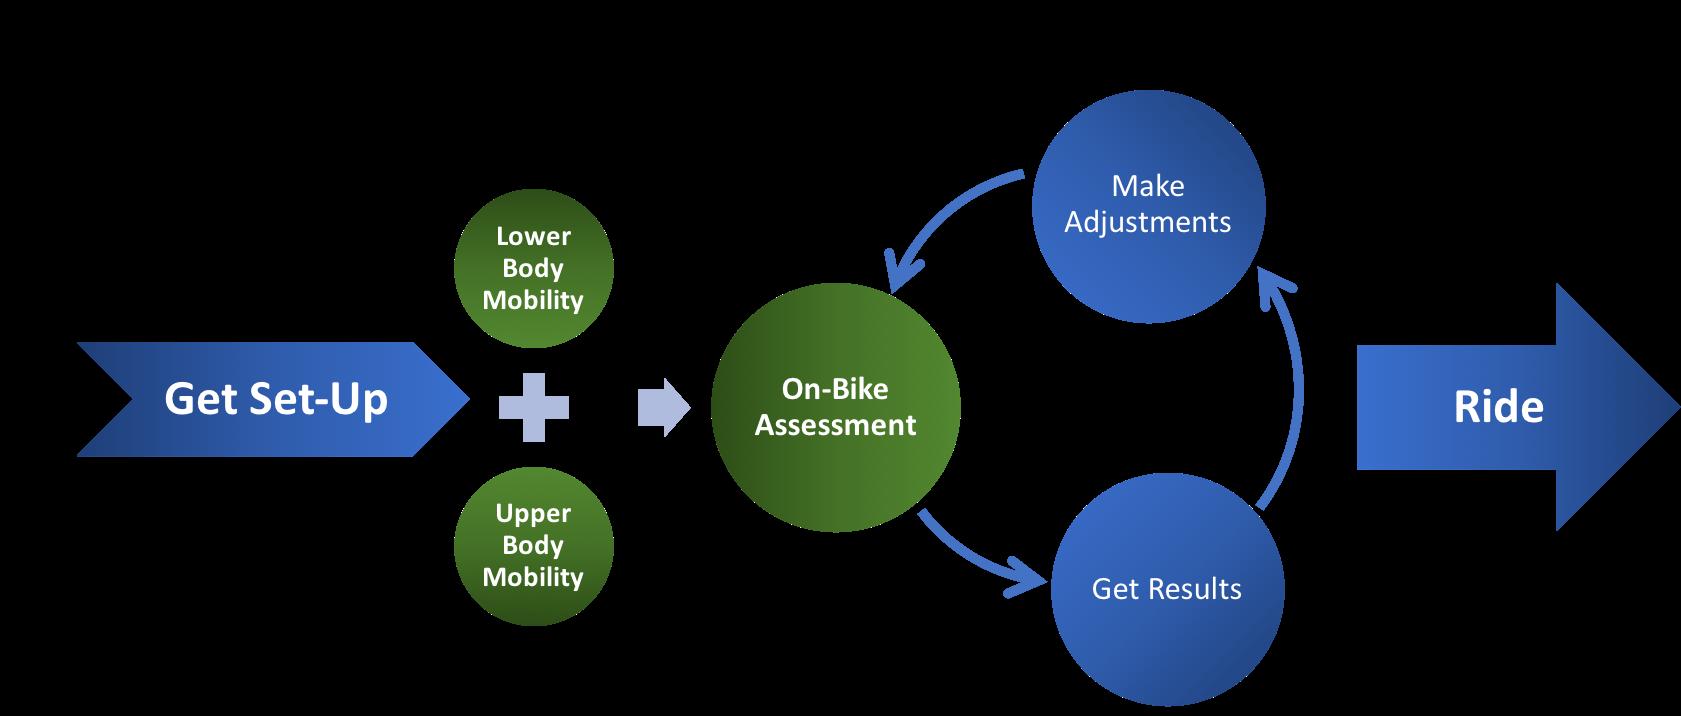 MyVeloFit iterative online bike fit process